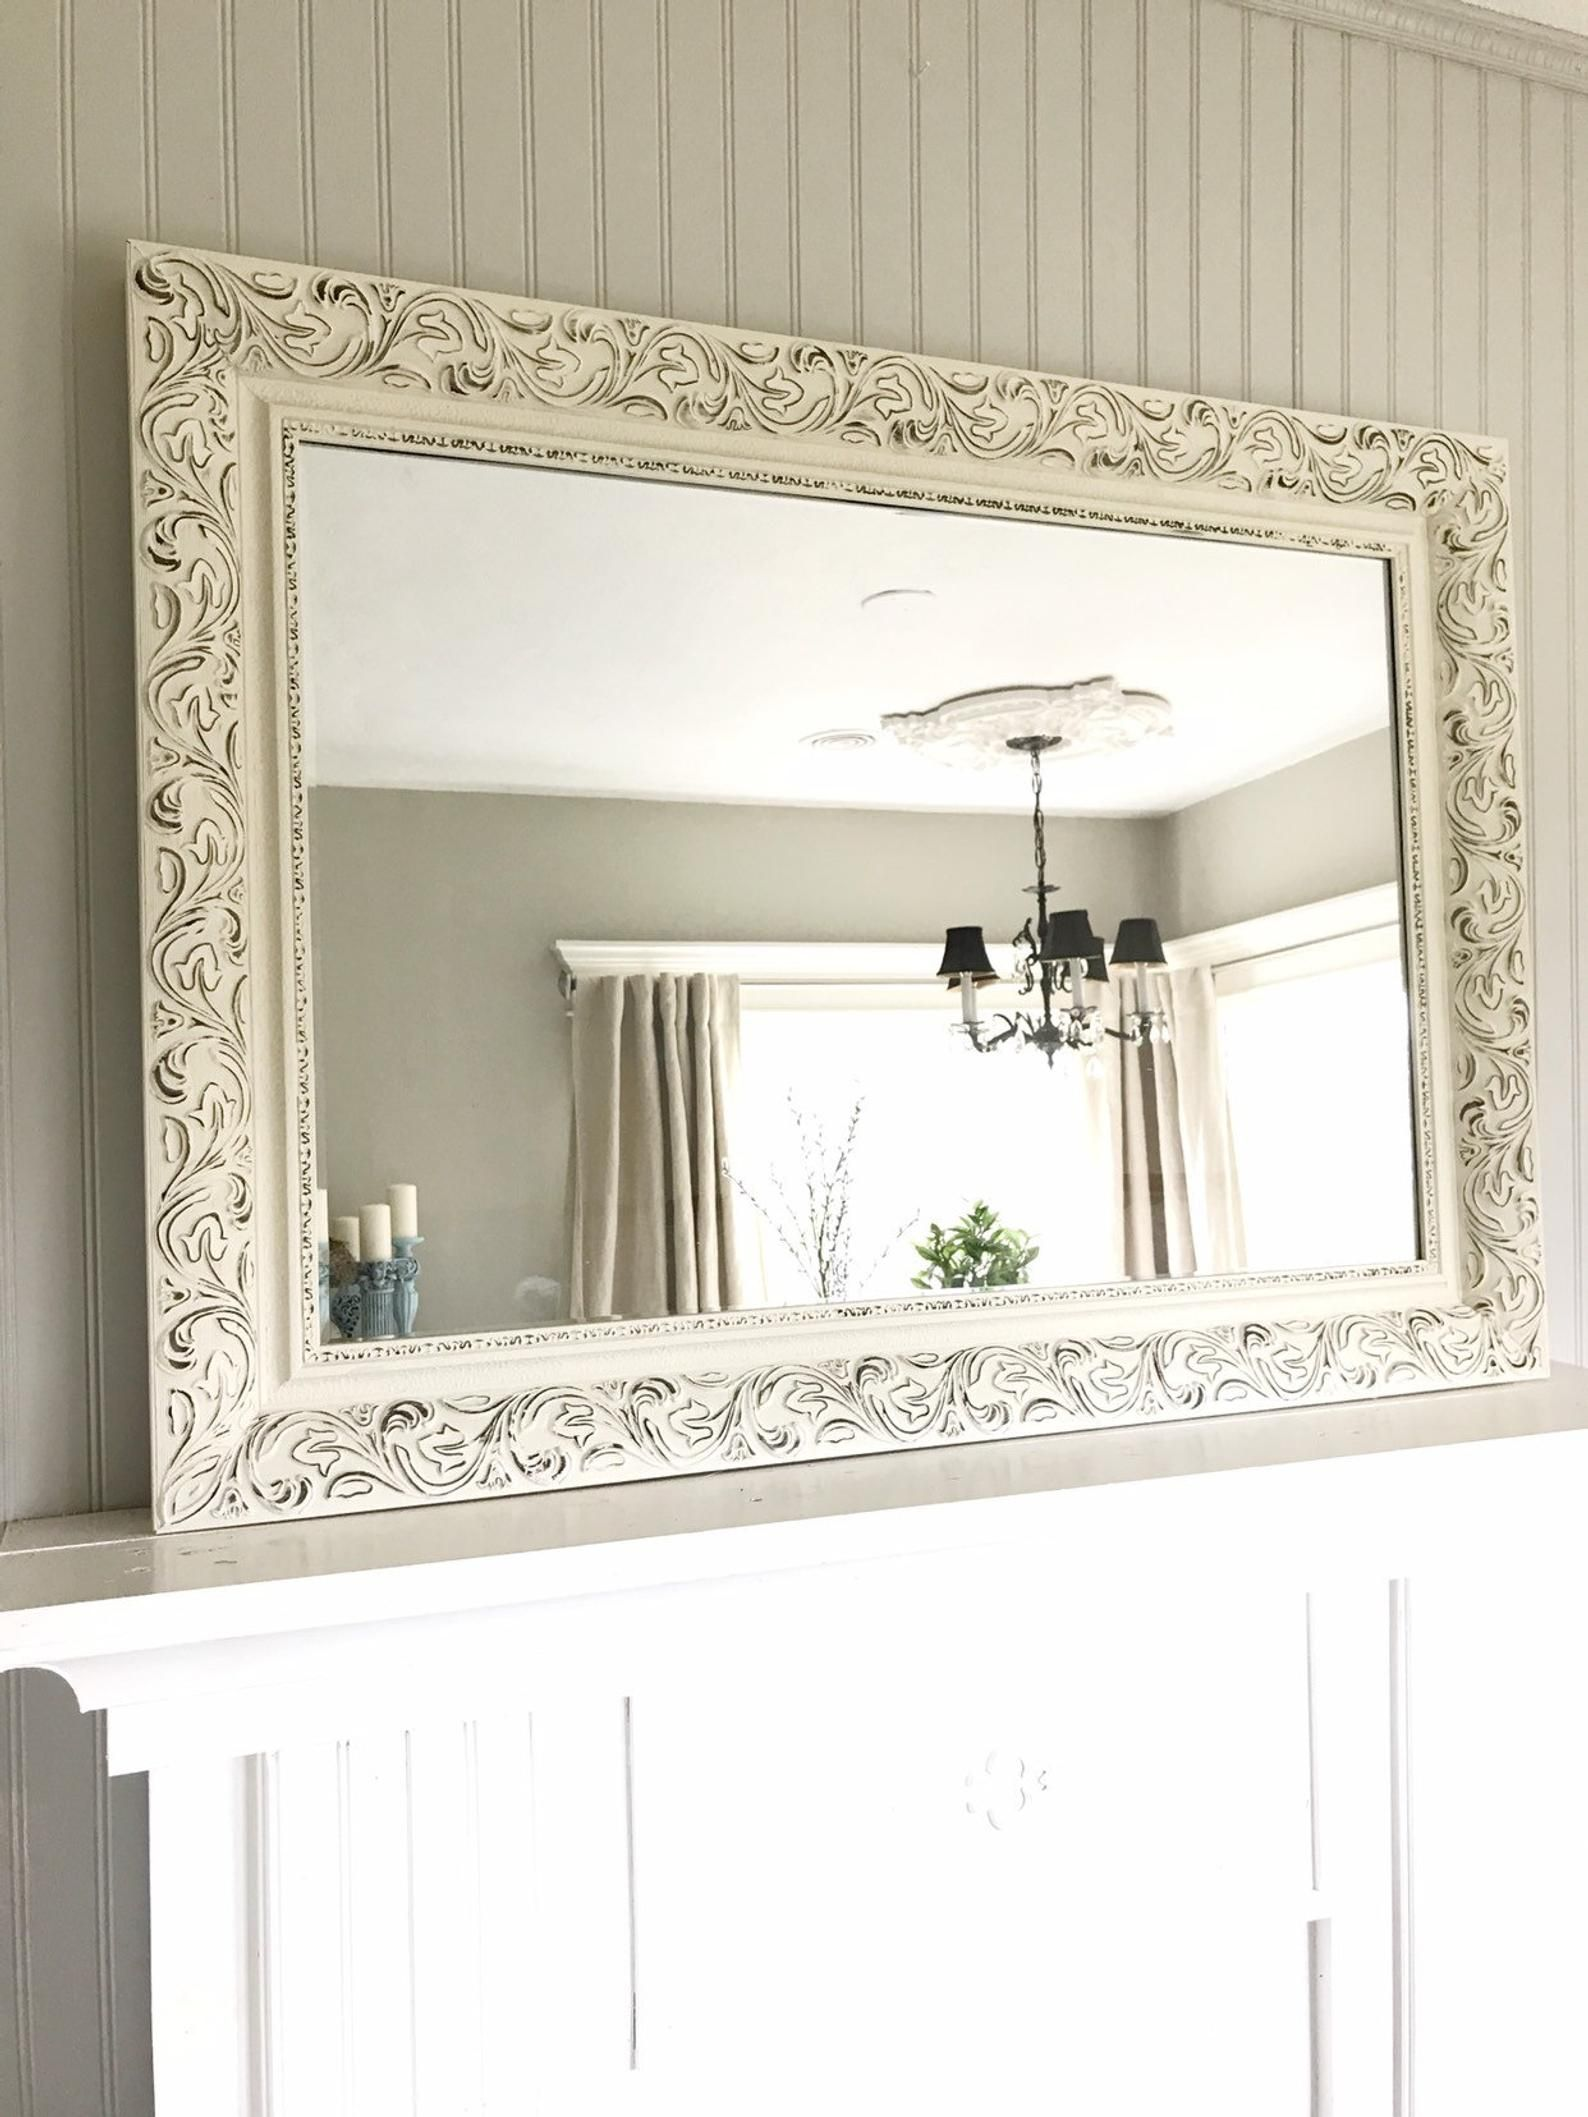 Cream And Black Bathroom Mirror Shabby Chic Style Farmhouse Etsy Shabby Chic Mirror Shabby Chic Bathroom Wood Framed Bathroom Mirrors